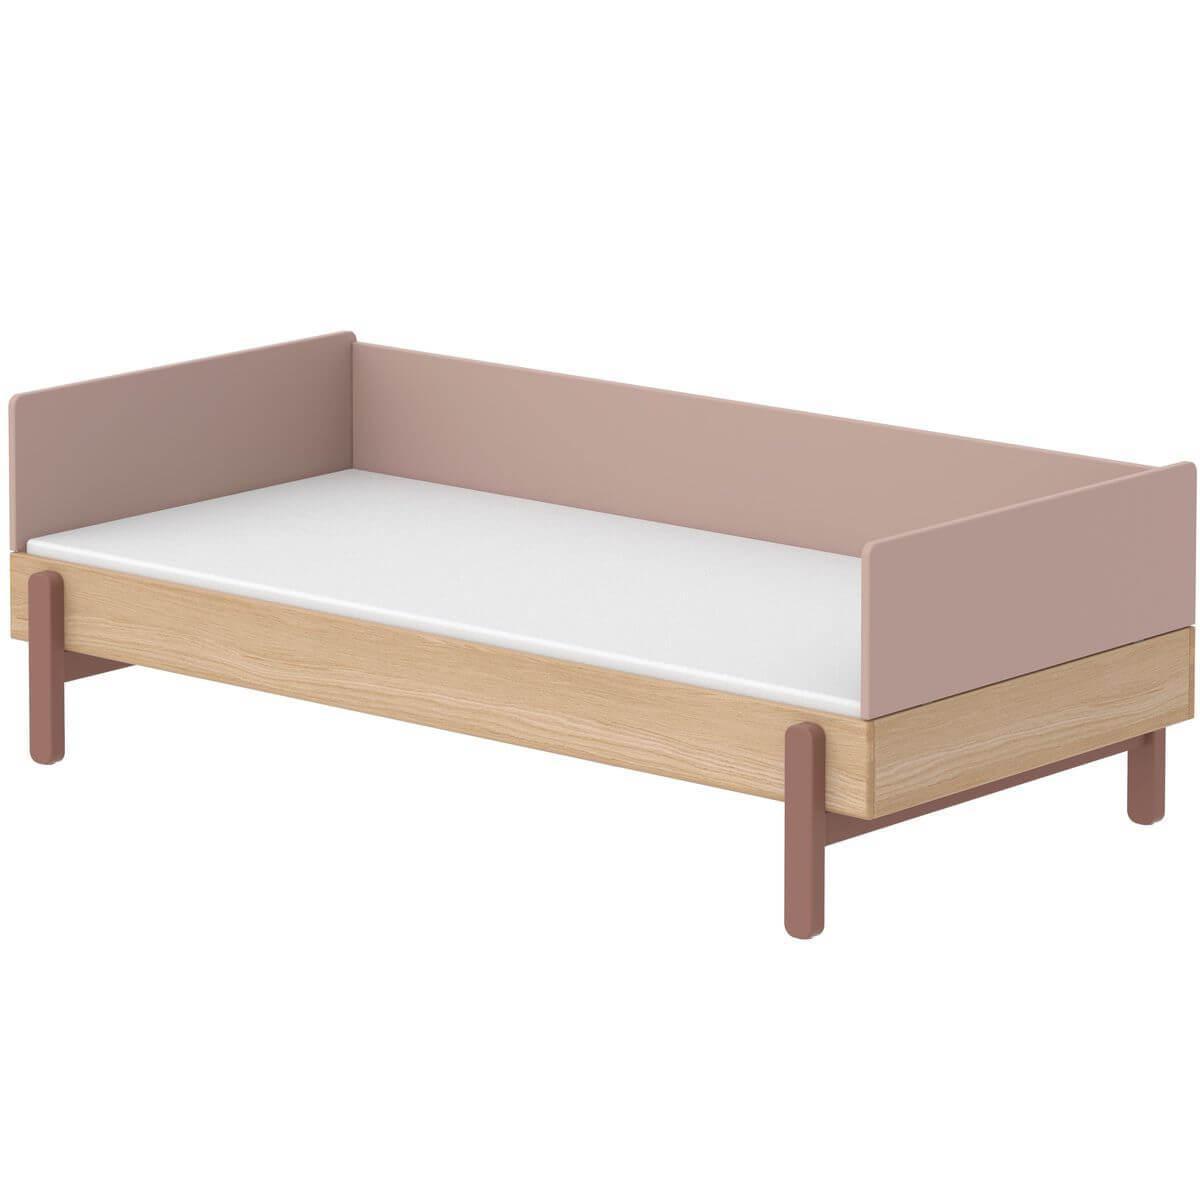 Cama-sofá 90x200cm POPSICLE Flexa roble-cherry